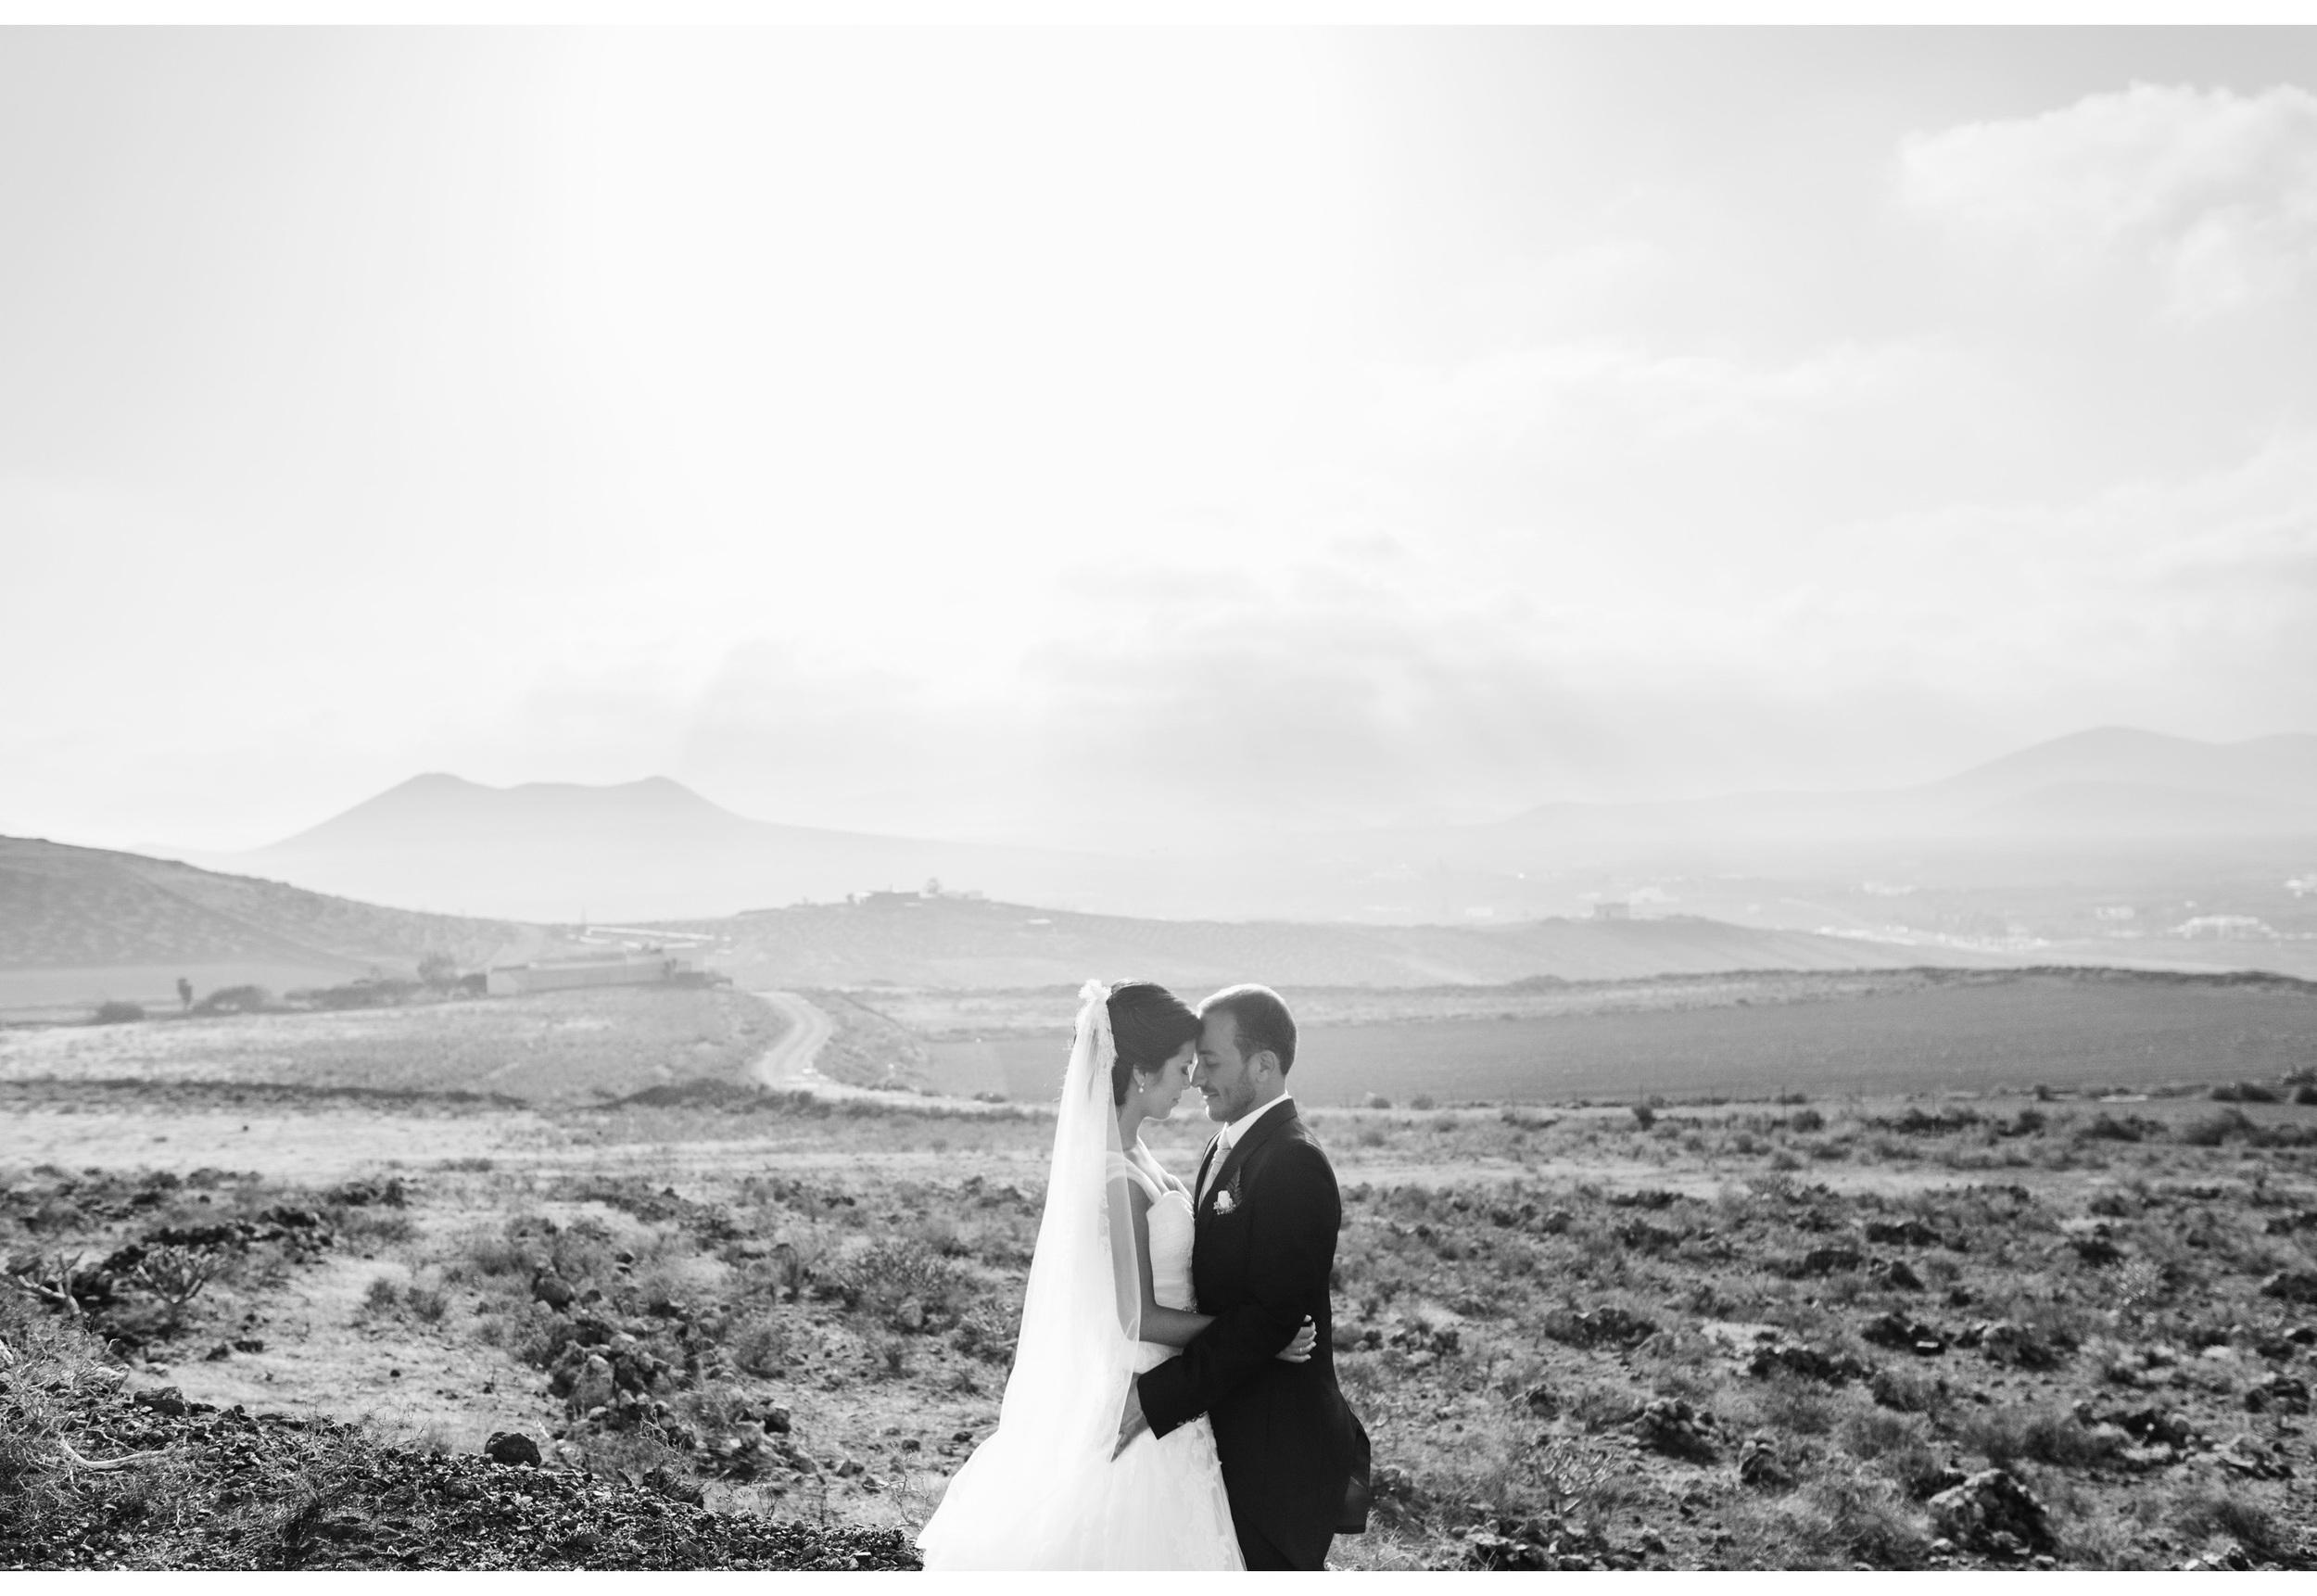 boda lanzarote 015.jpg